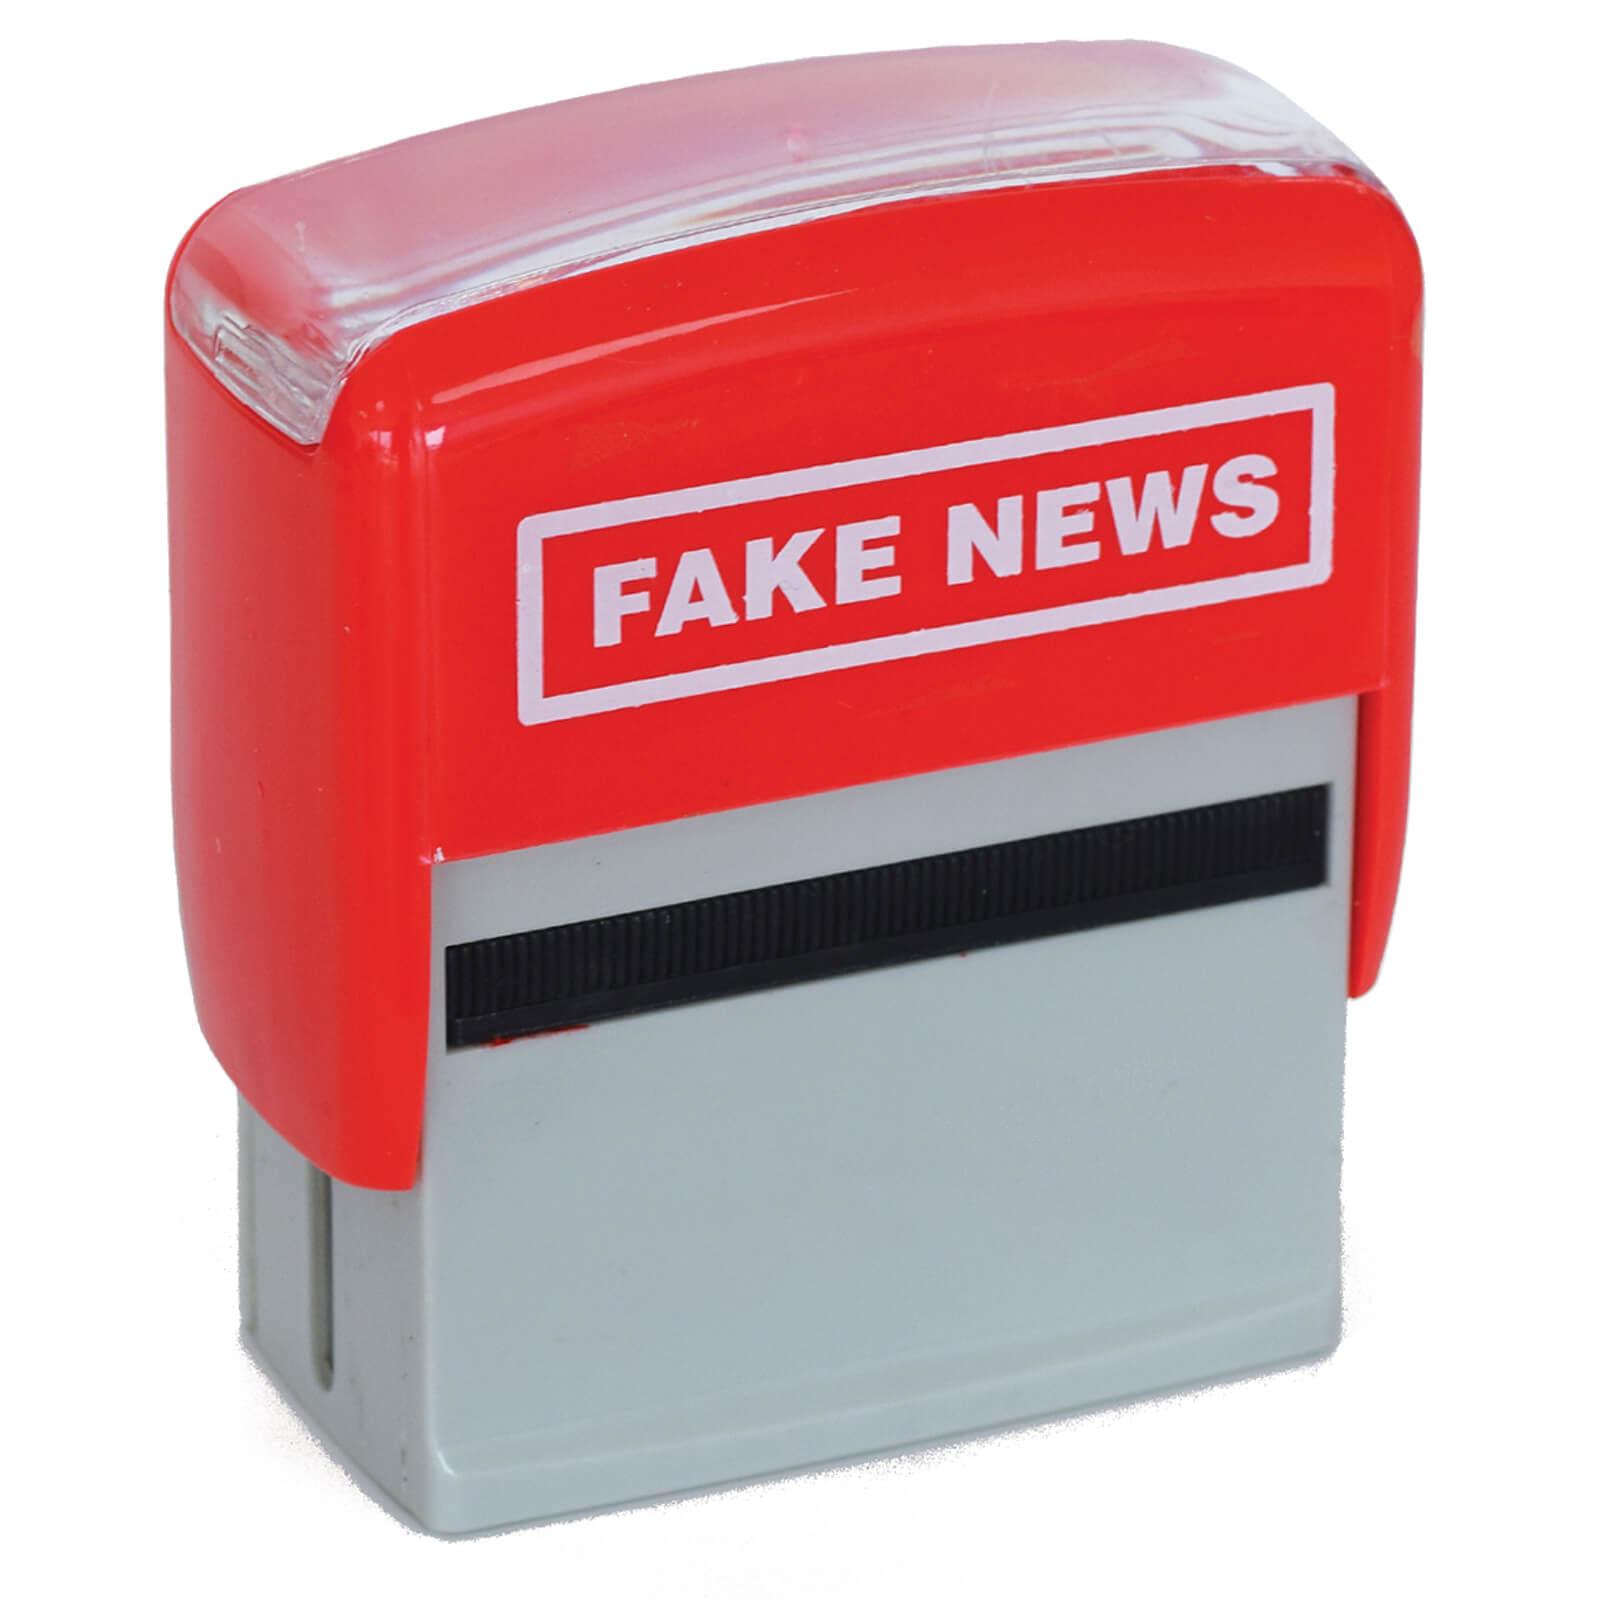 Image of Fake News Stamp